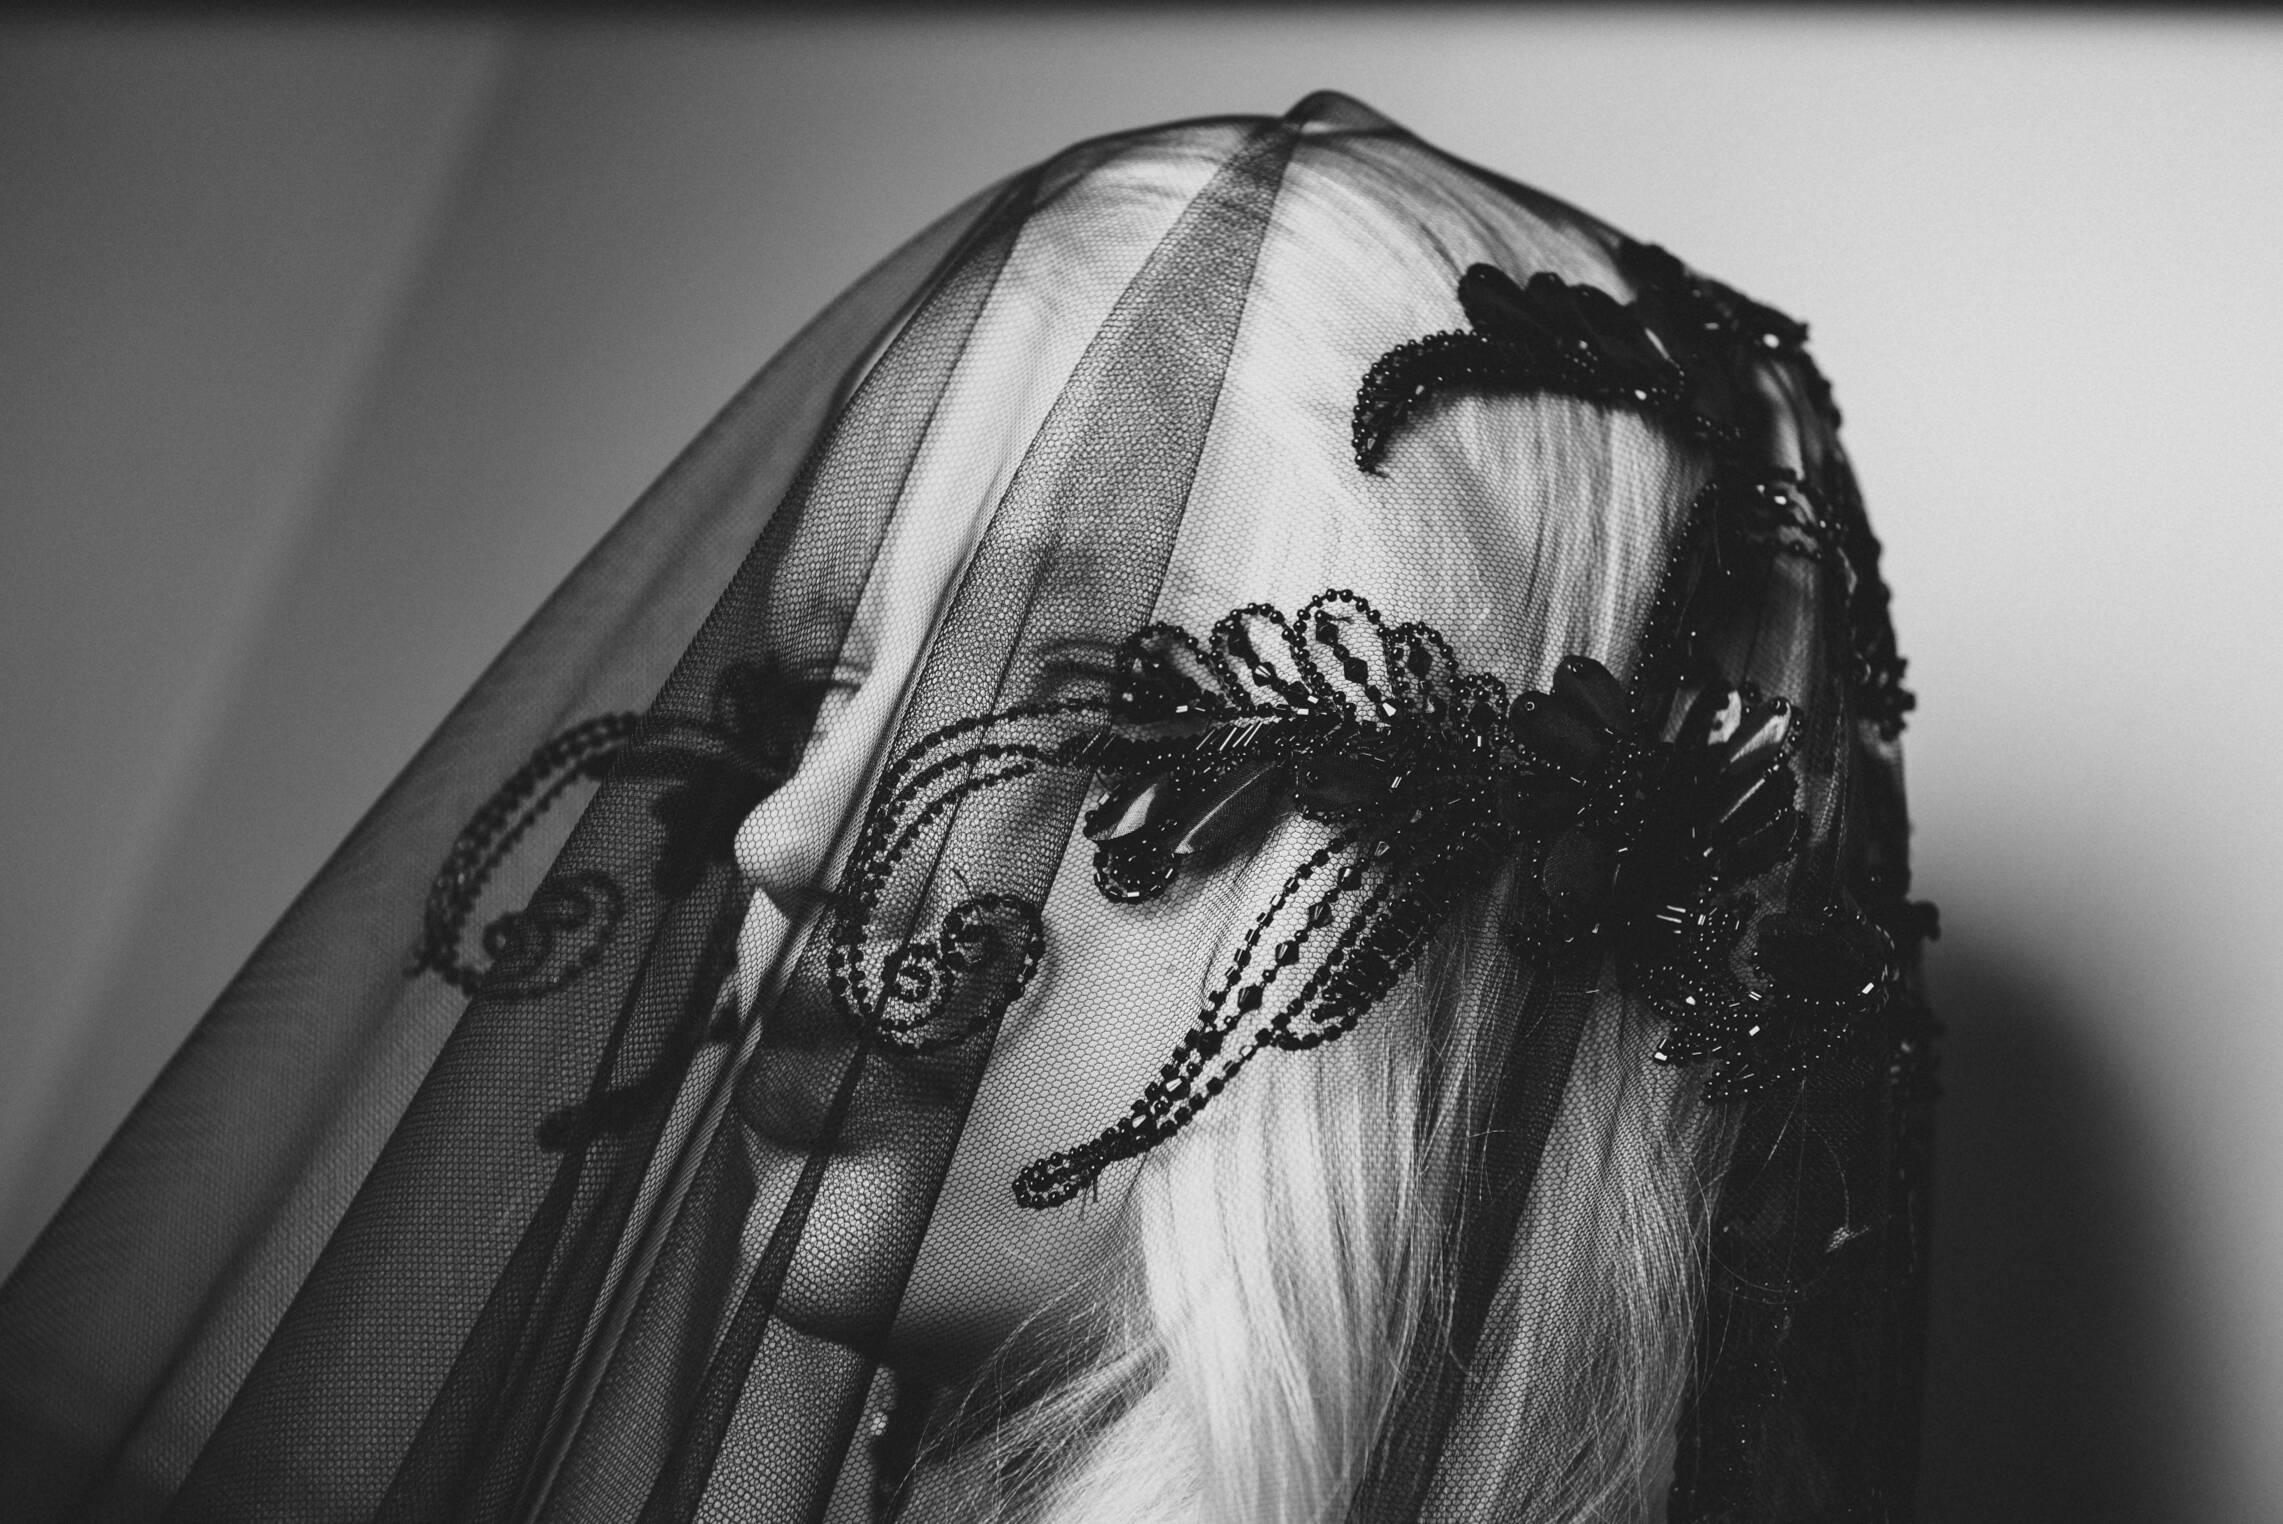 Backstage Alberta Ferretti Limited 2017 Womens Collection Milan Fashion Week